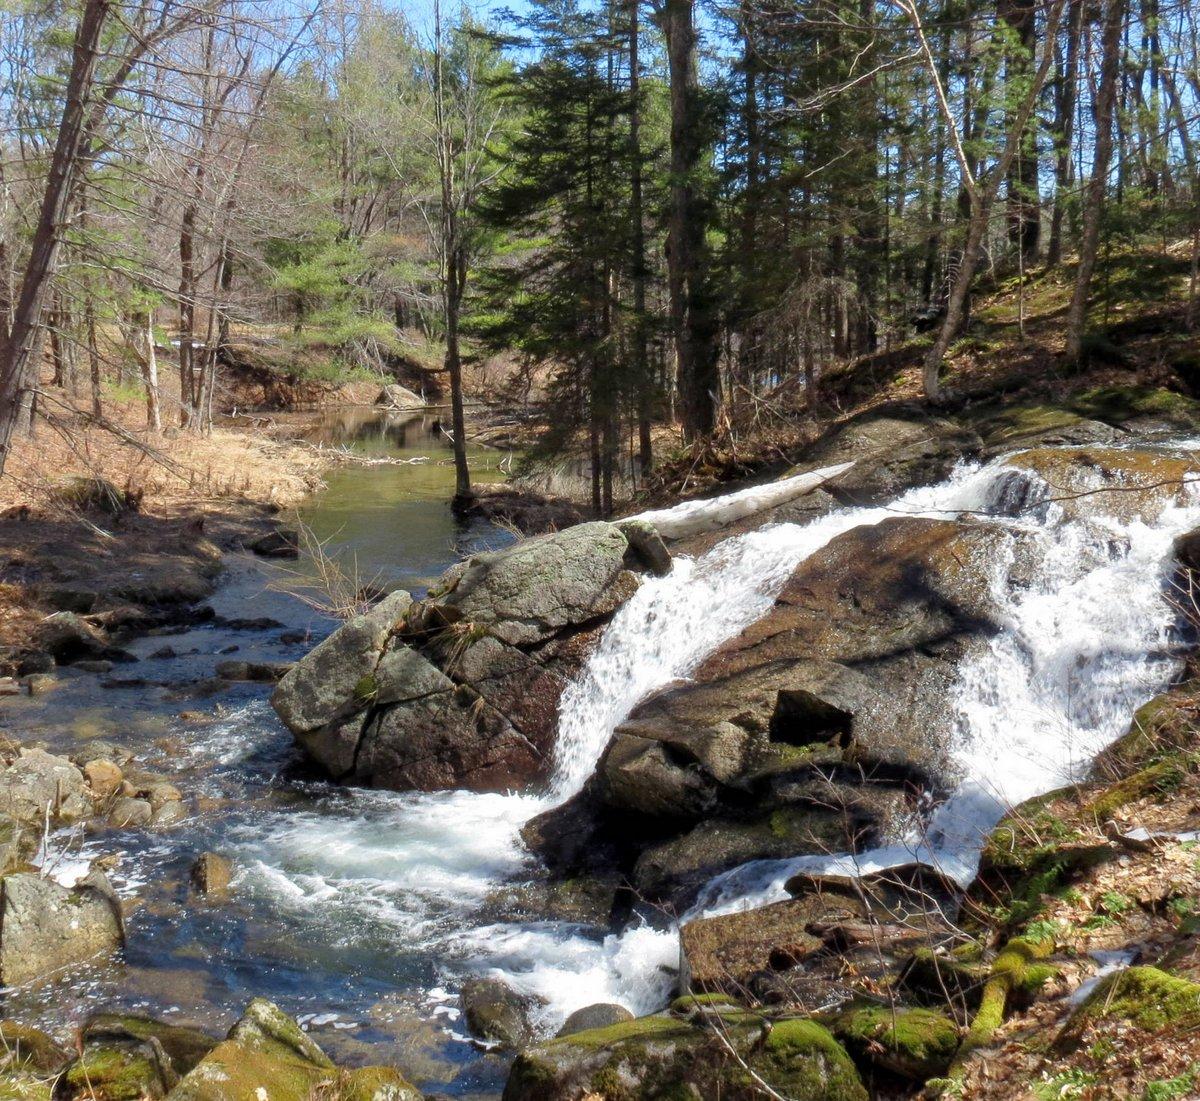 4. Bailey Brook Falls